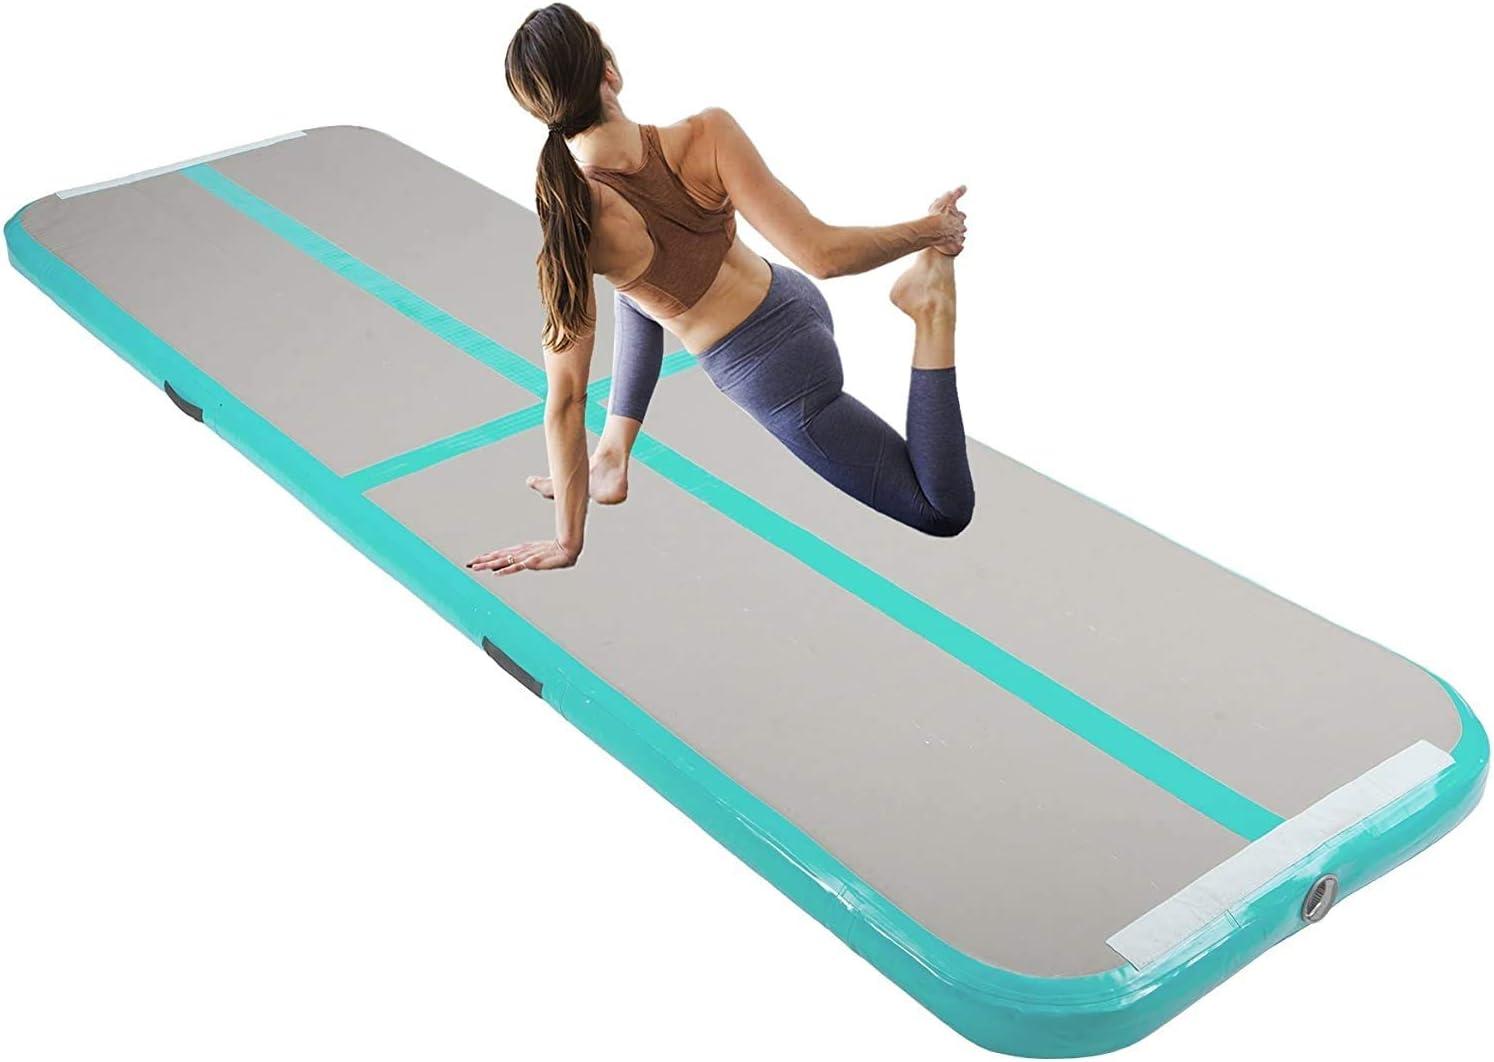 Z ZELUS Air Matte Track aufblasbare Gymnastikmatte Tumbling Matte Gymnastikmatte Turnmatte Bodenmatte Inflatable Taekwondo Yoga Air Track Gymnastics Mat